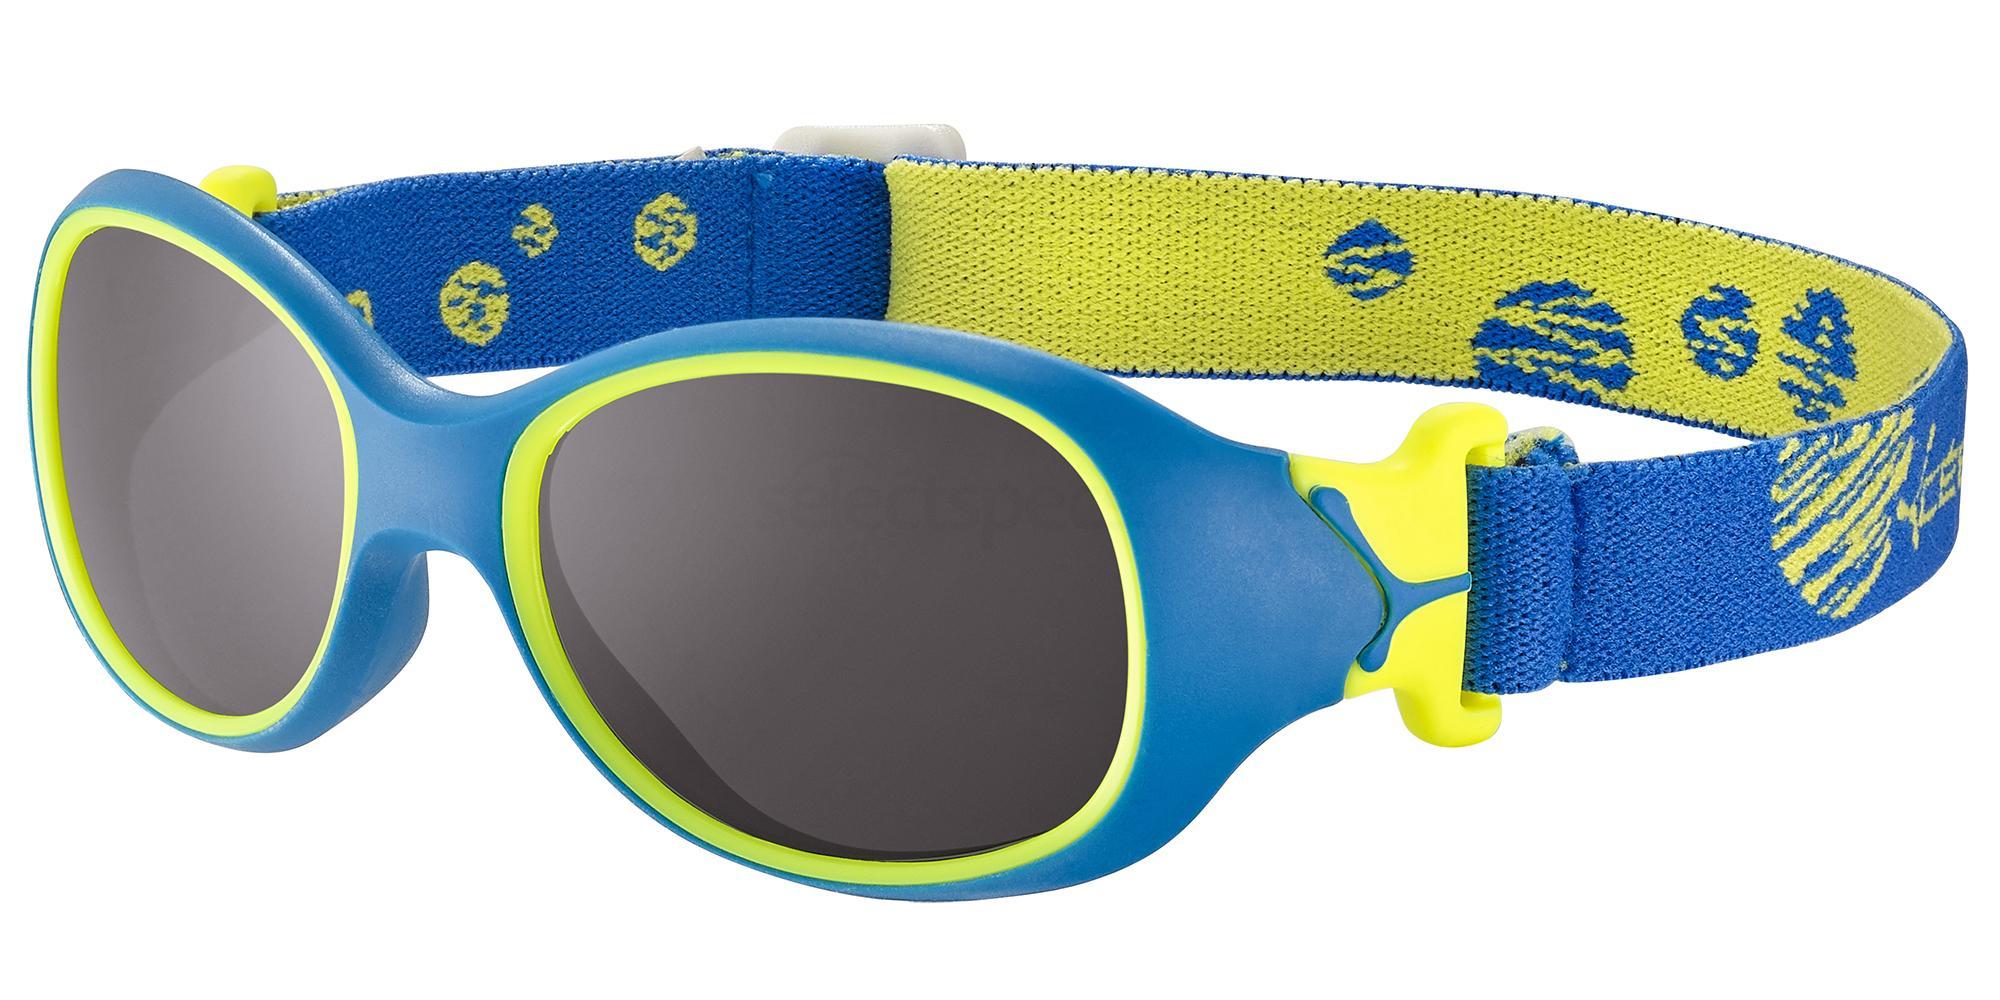 CBS150 KATCHOU (Age 0-1,5) Sunglasses, Cebe JUNIOR